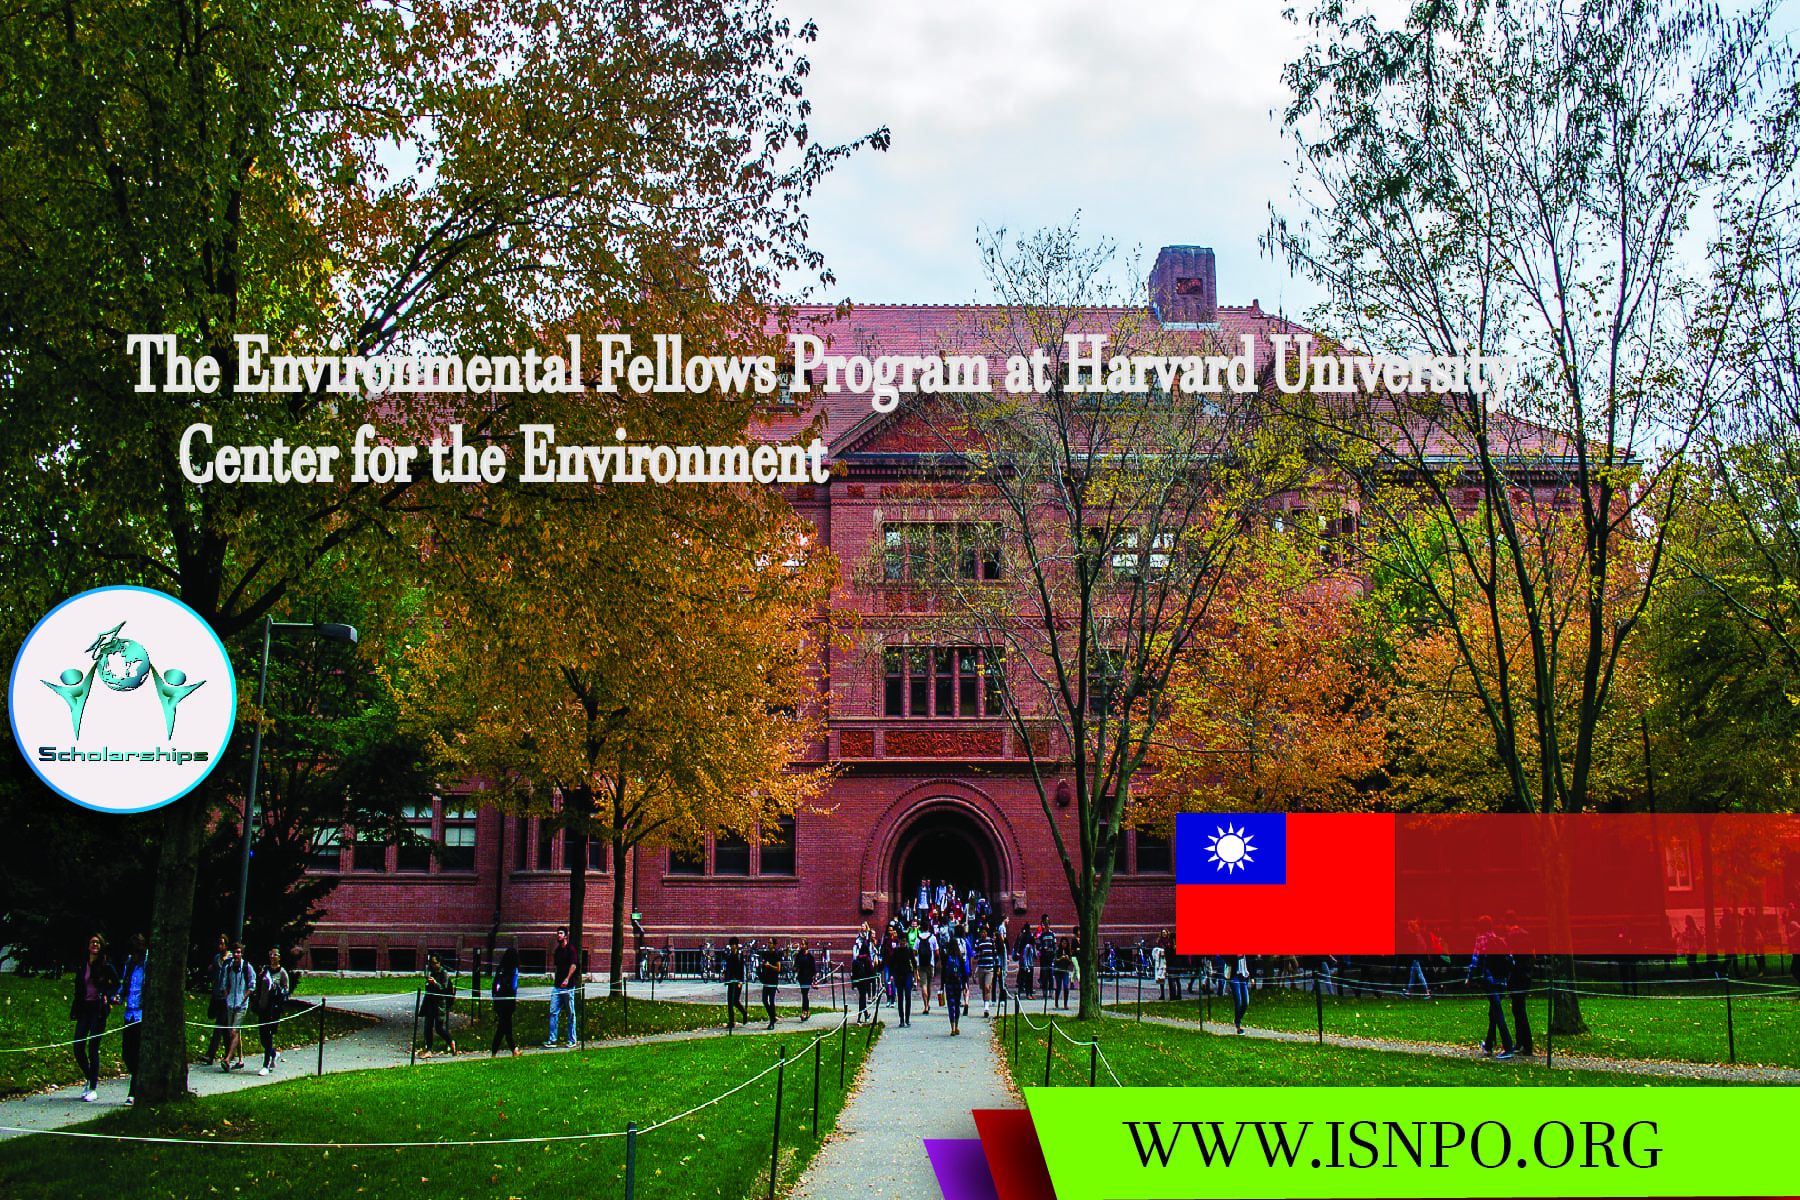 The Environmental Fellows Program at Harvard University Center for the Environment